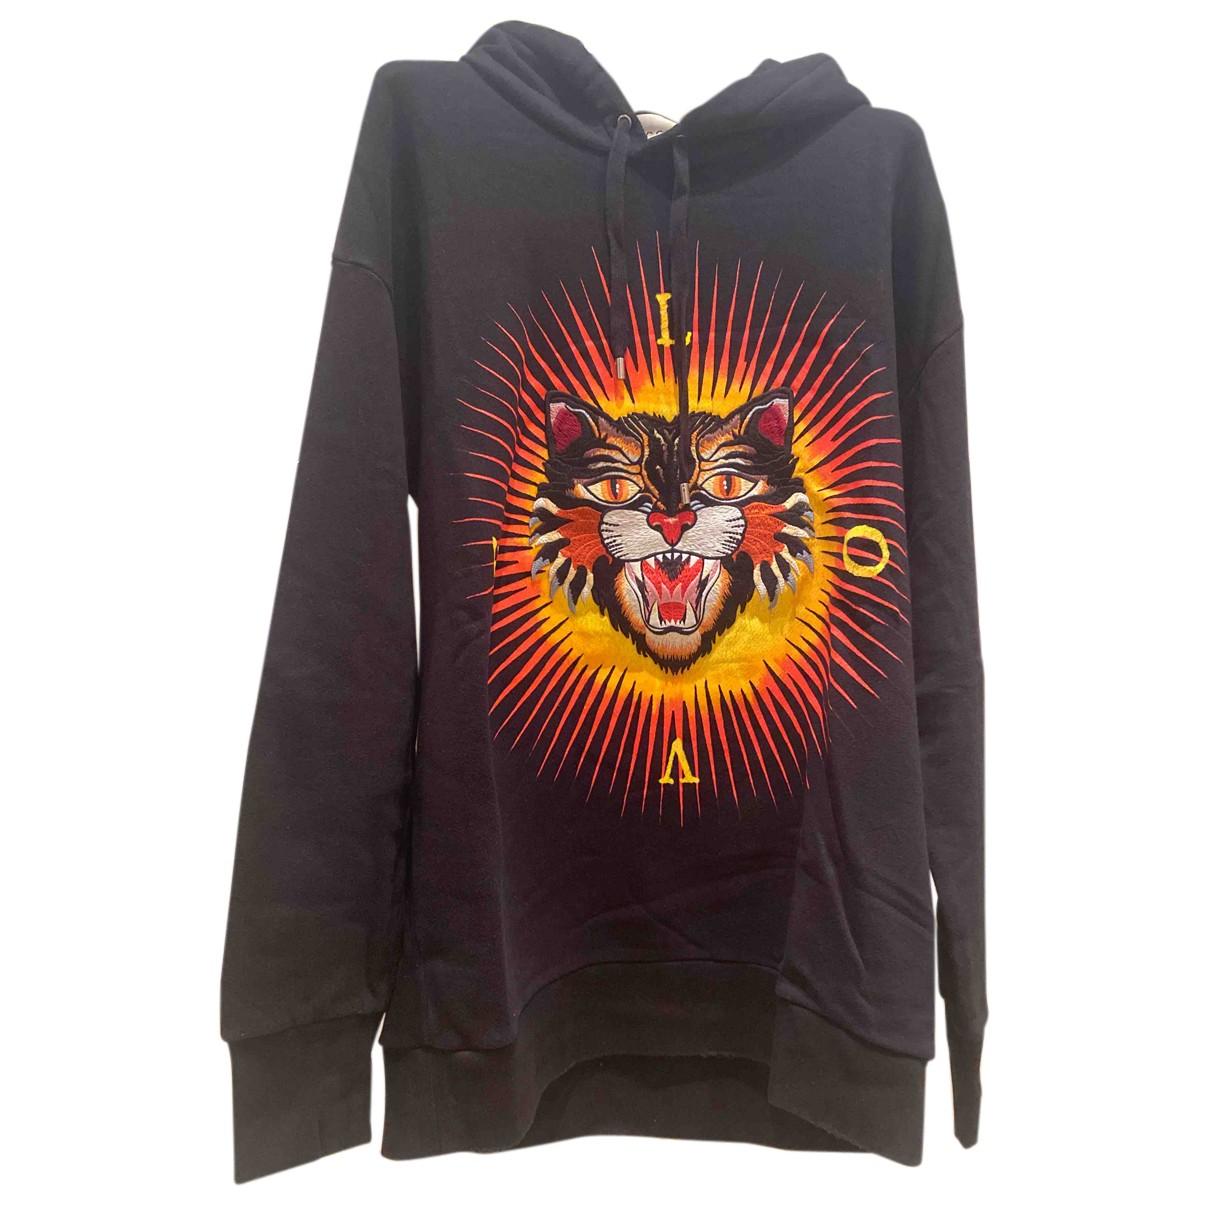 Gucci N Black Cotton Knitwear & Sweatshirts for Men L International